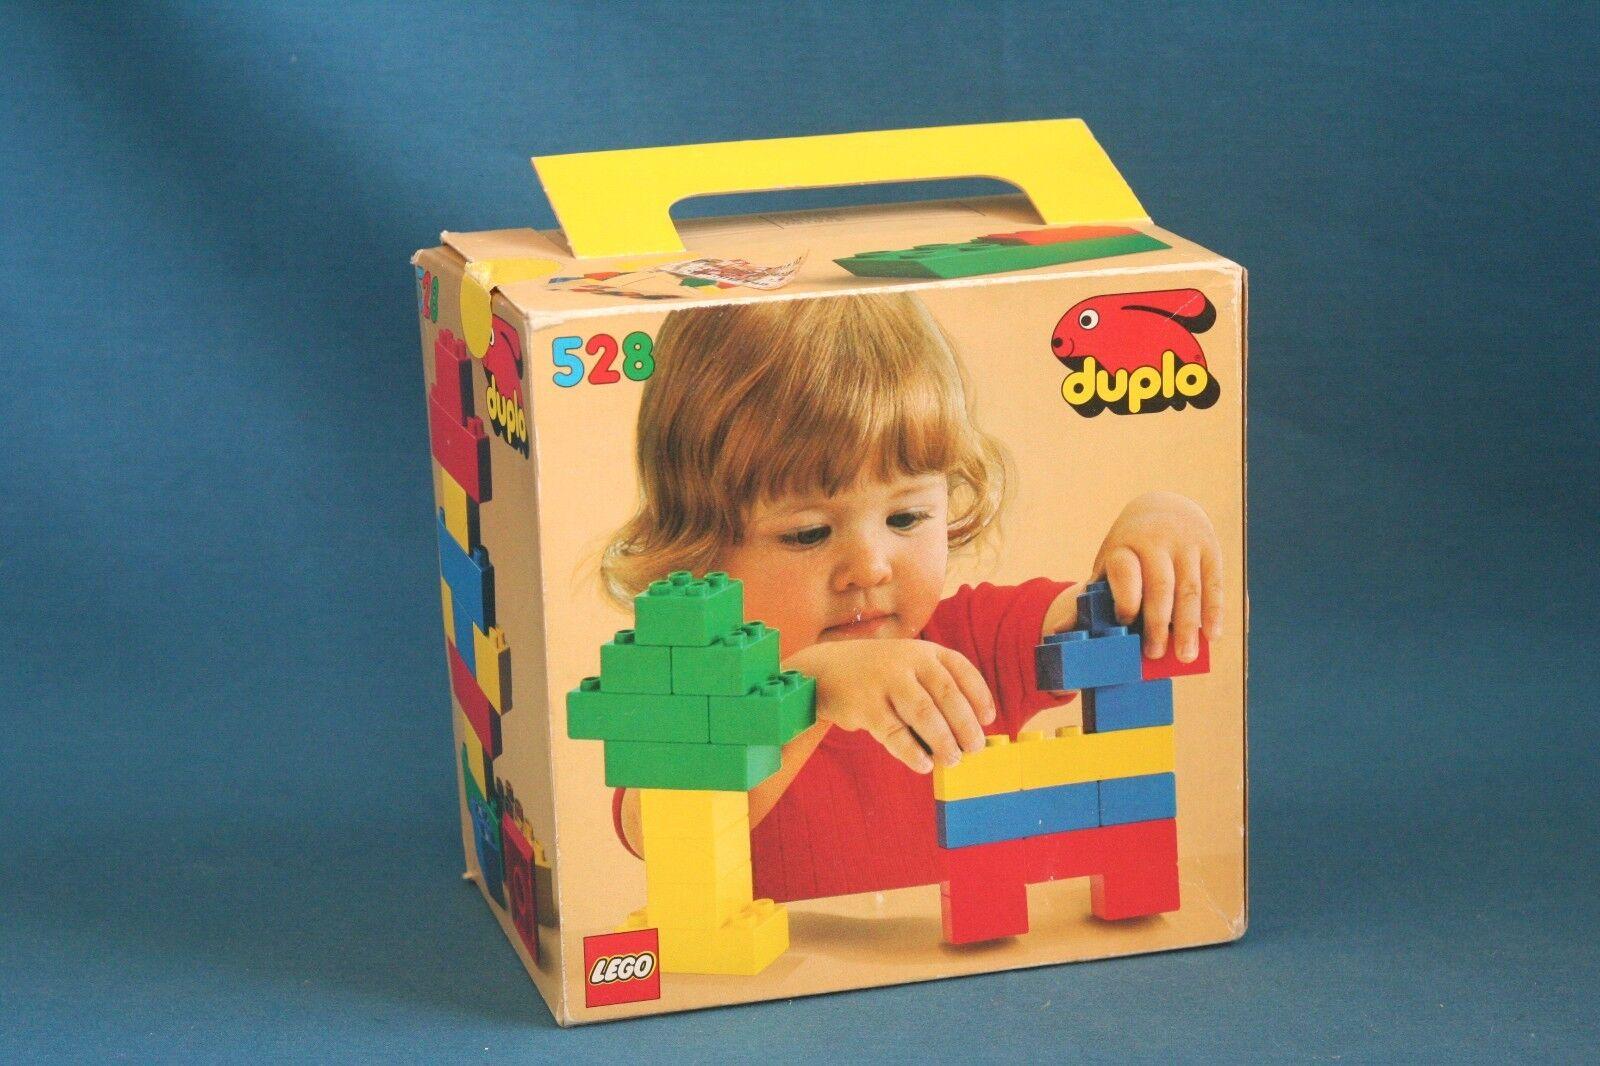 Vintage Lego duplo Box 528 1978 Denmark lego system  Never opened very SEALED